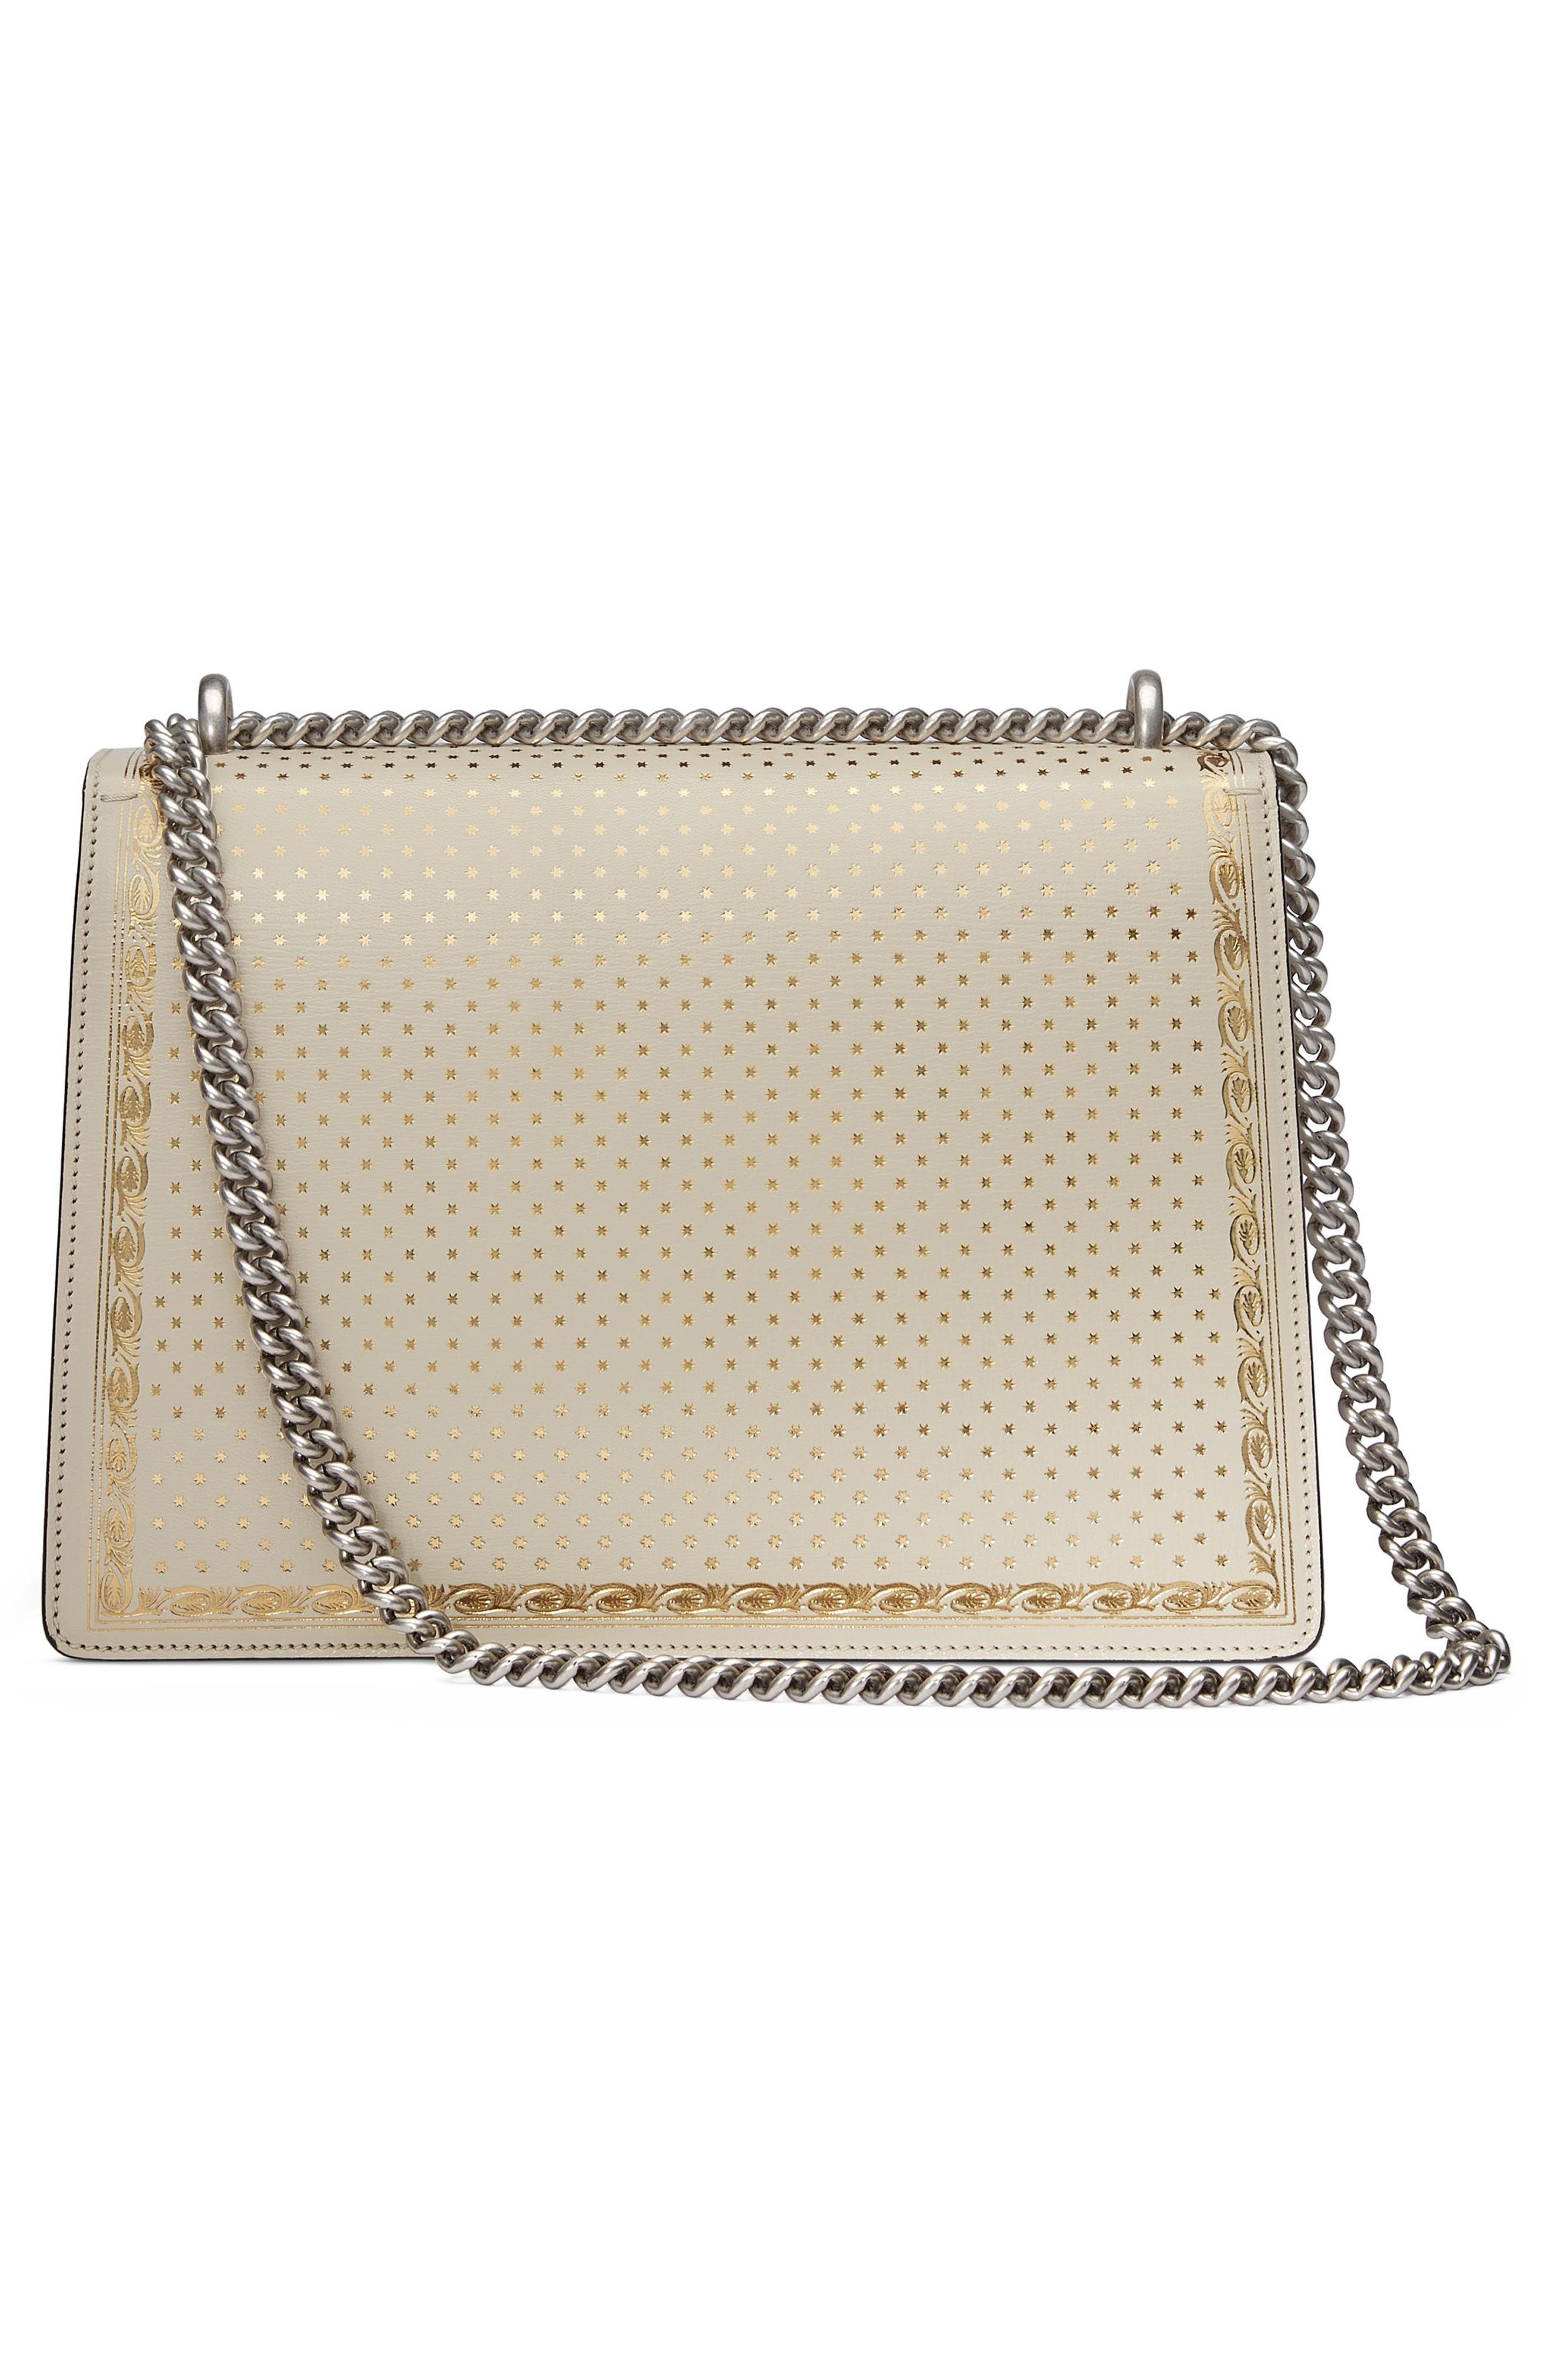 Dionysus Moon & Stars Leather Shoulder Bag,                             Alternate thumbnail 2, color,                             Mystic White/ Oro